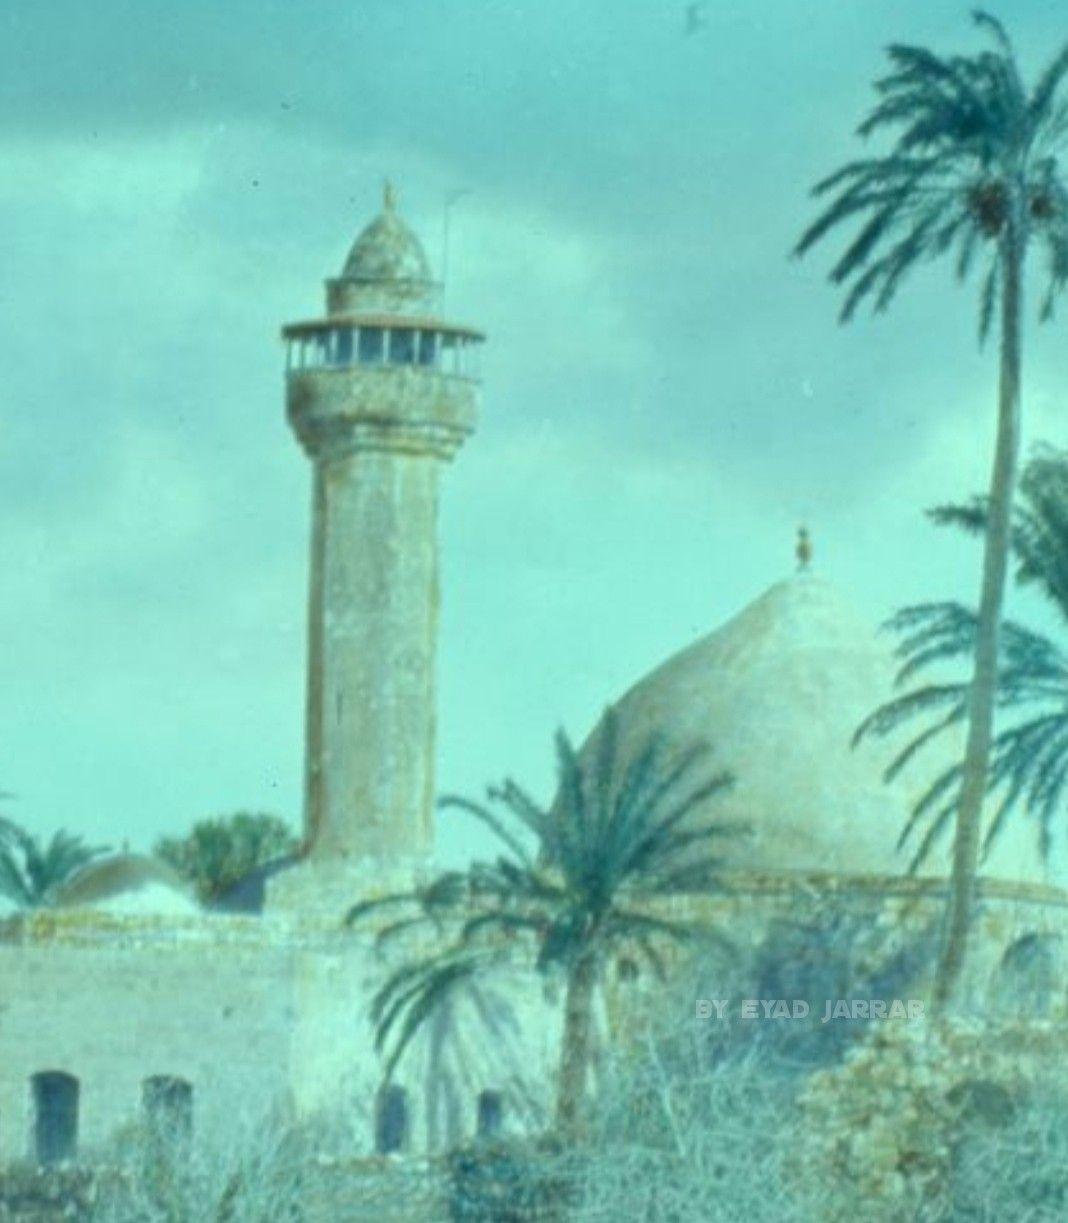 جنين زمان مسجد فاطمة خاتون مسجد جنين الكبير عام 1900م Beautiful Places Places Beautiful